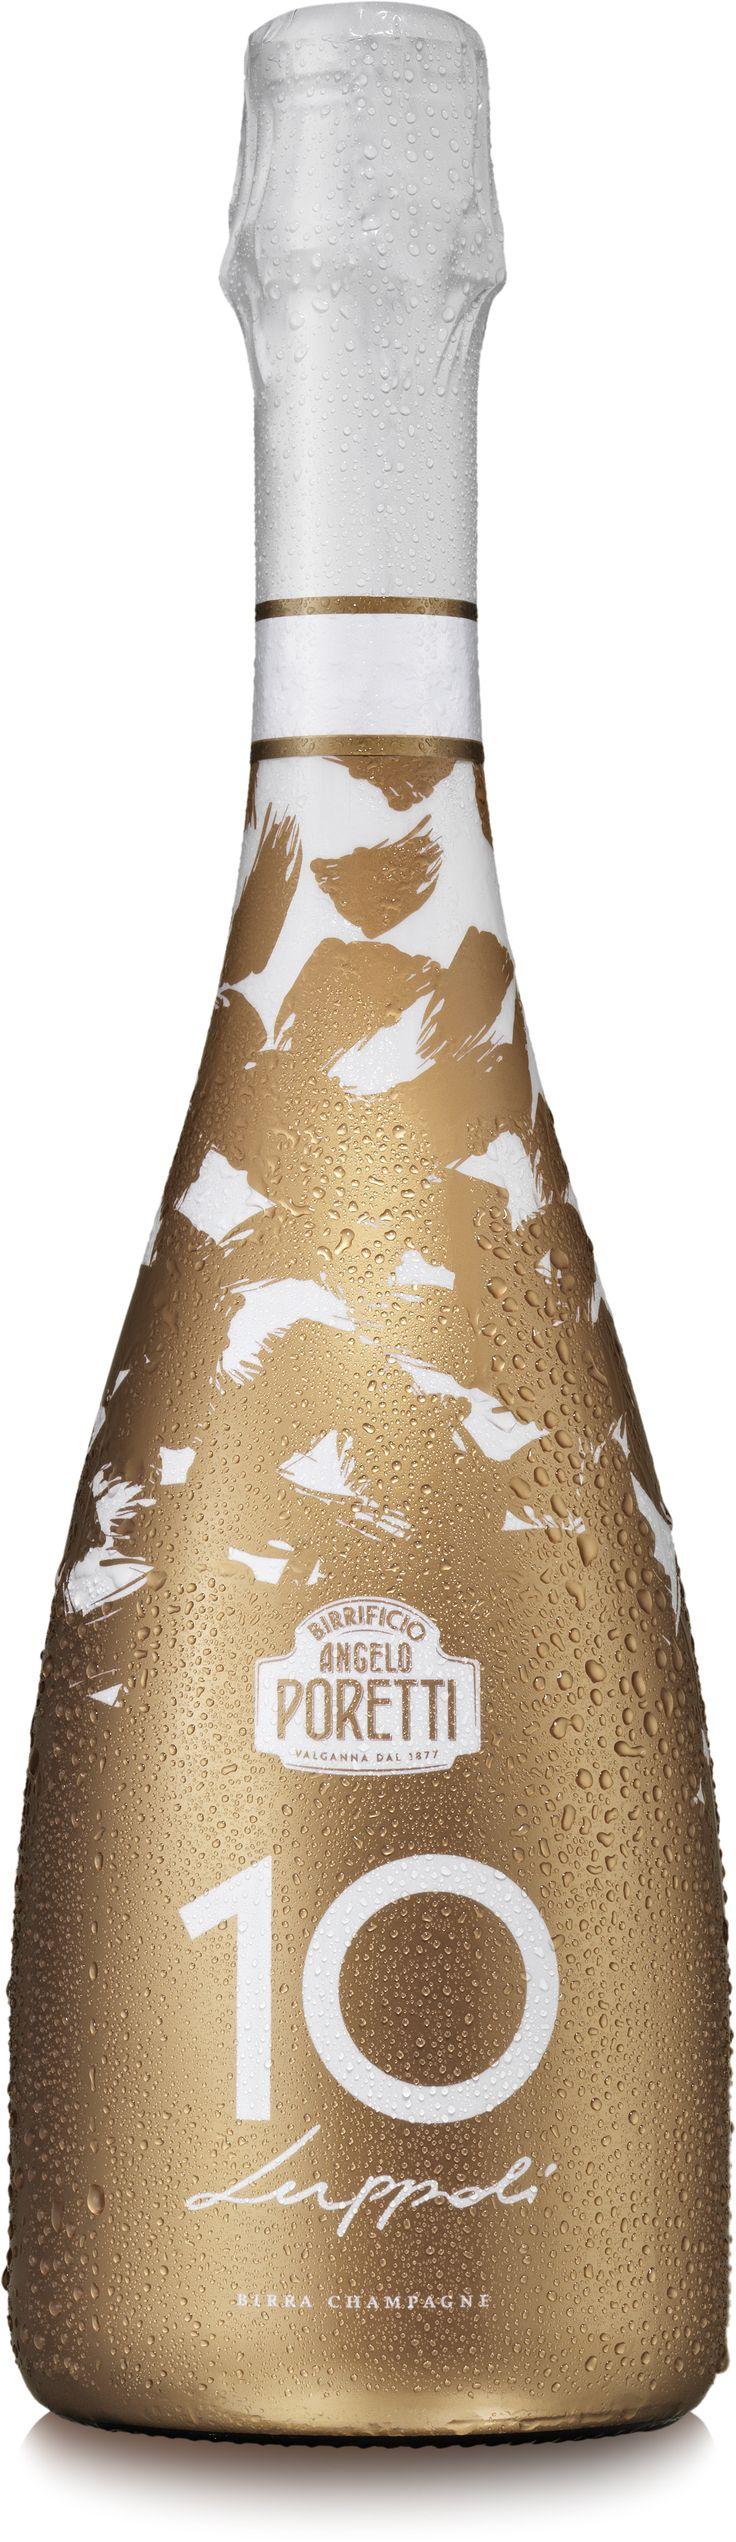 Birra Poretti - 10 Luppoli - Stile Birra Champagne #Sleever